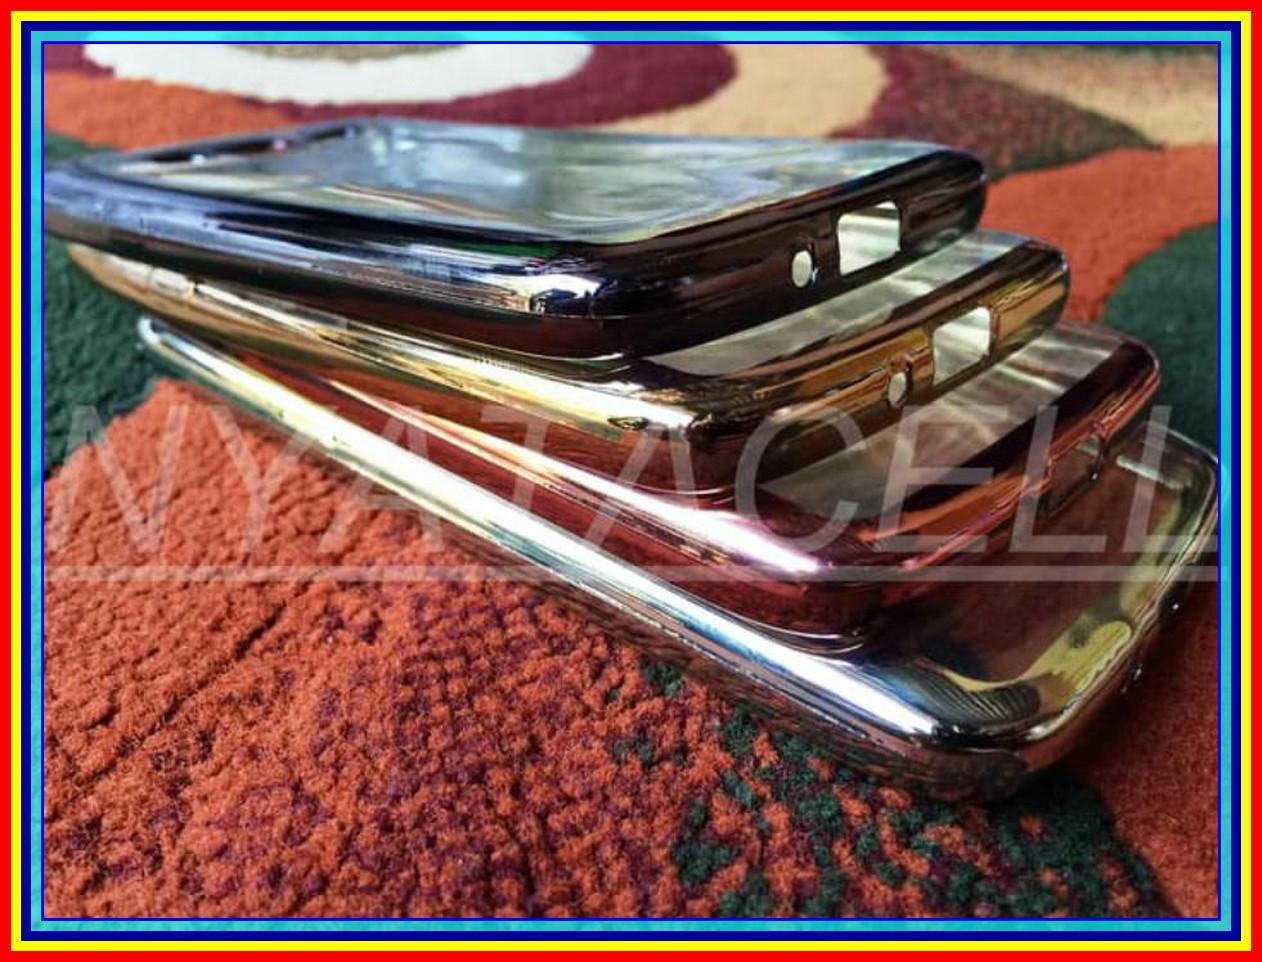 ... Case List Chrome Samsung Galaxy Grand 2 Softcase Tpu Ultrathin Silikon - 3 ...